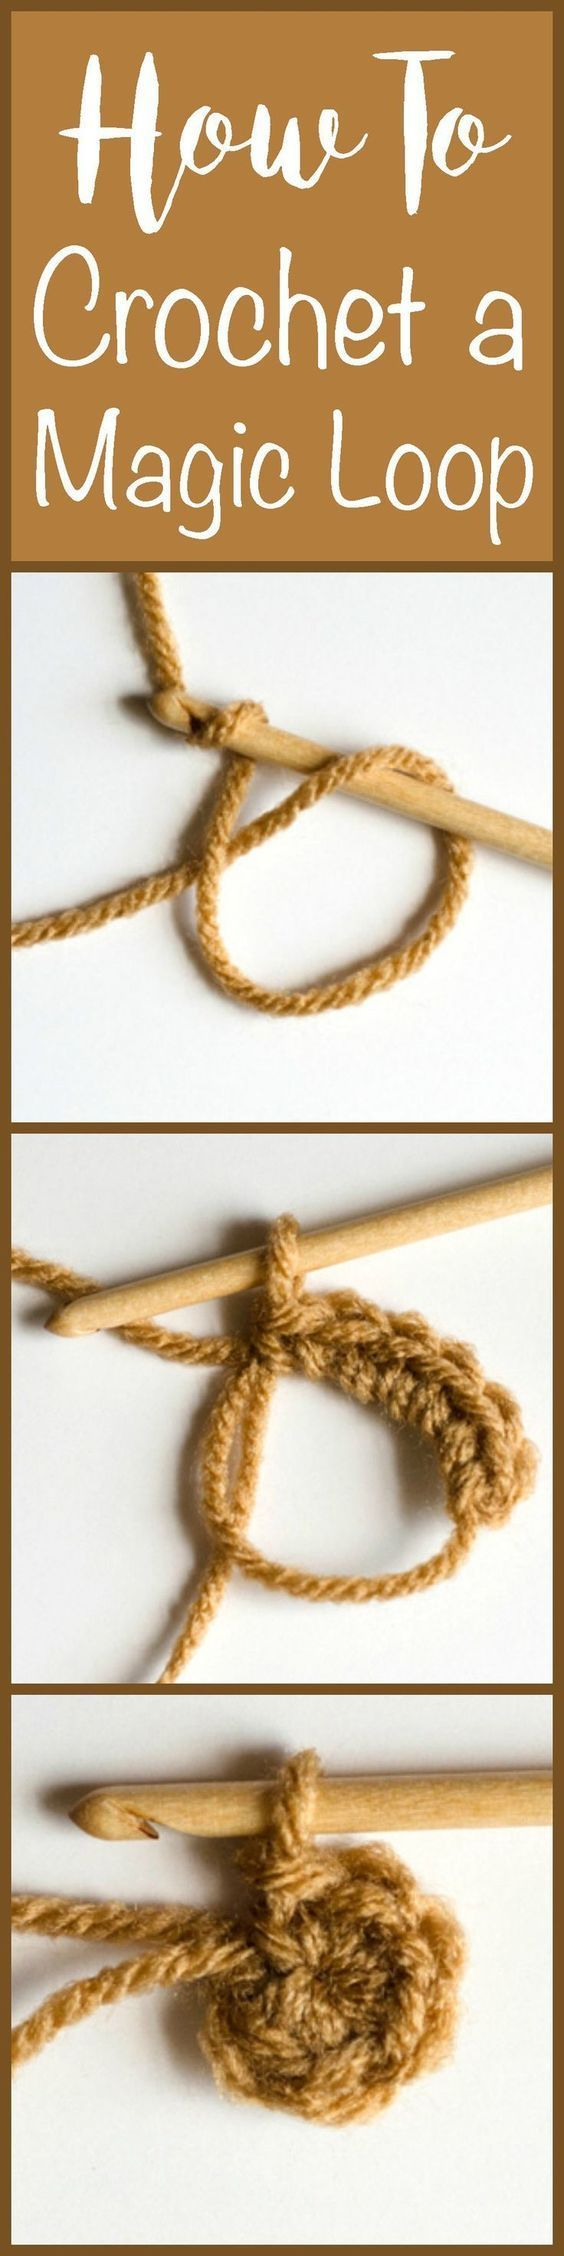 Finally! A great magic ring tutorial. Love this magic loop method!